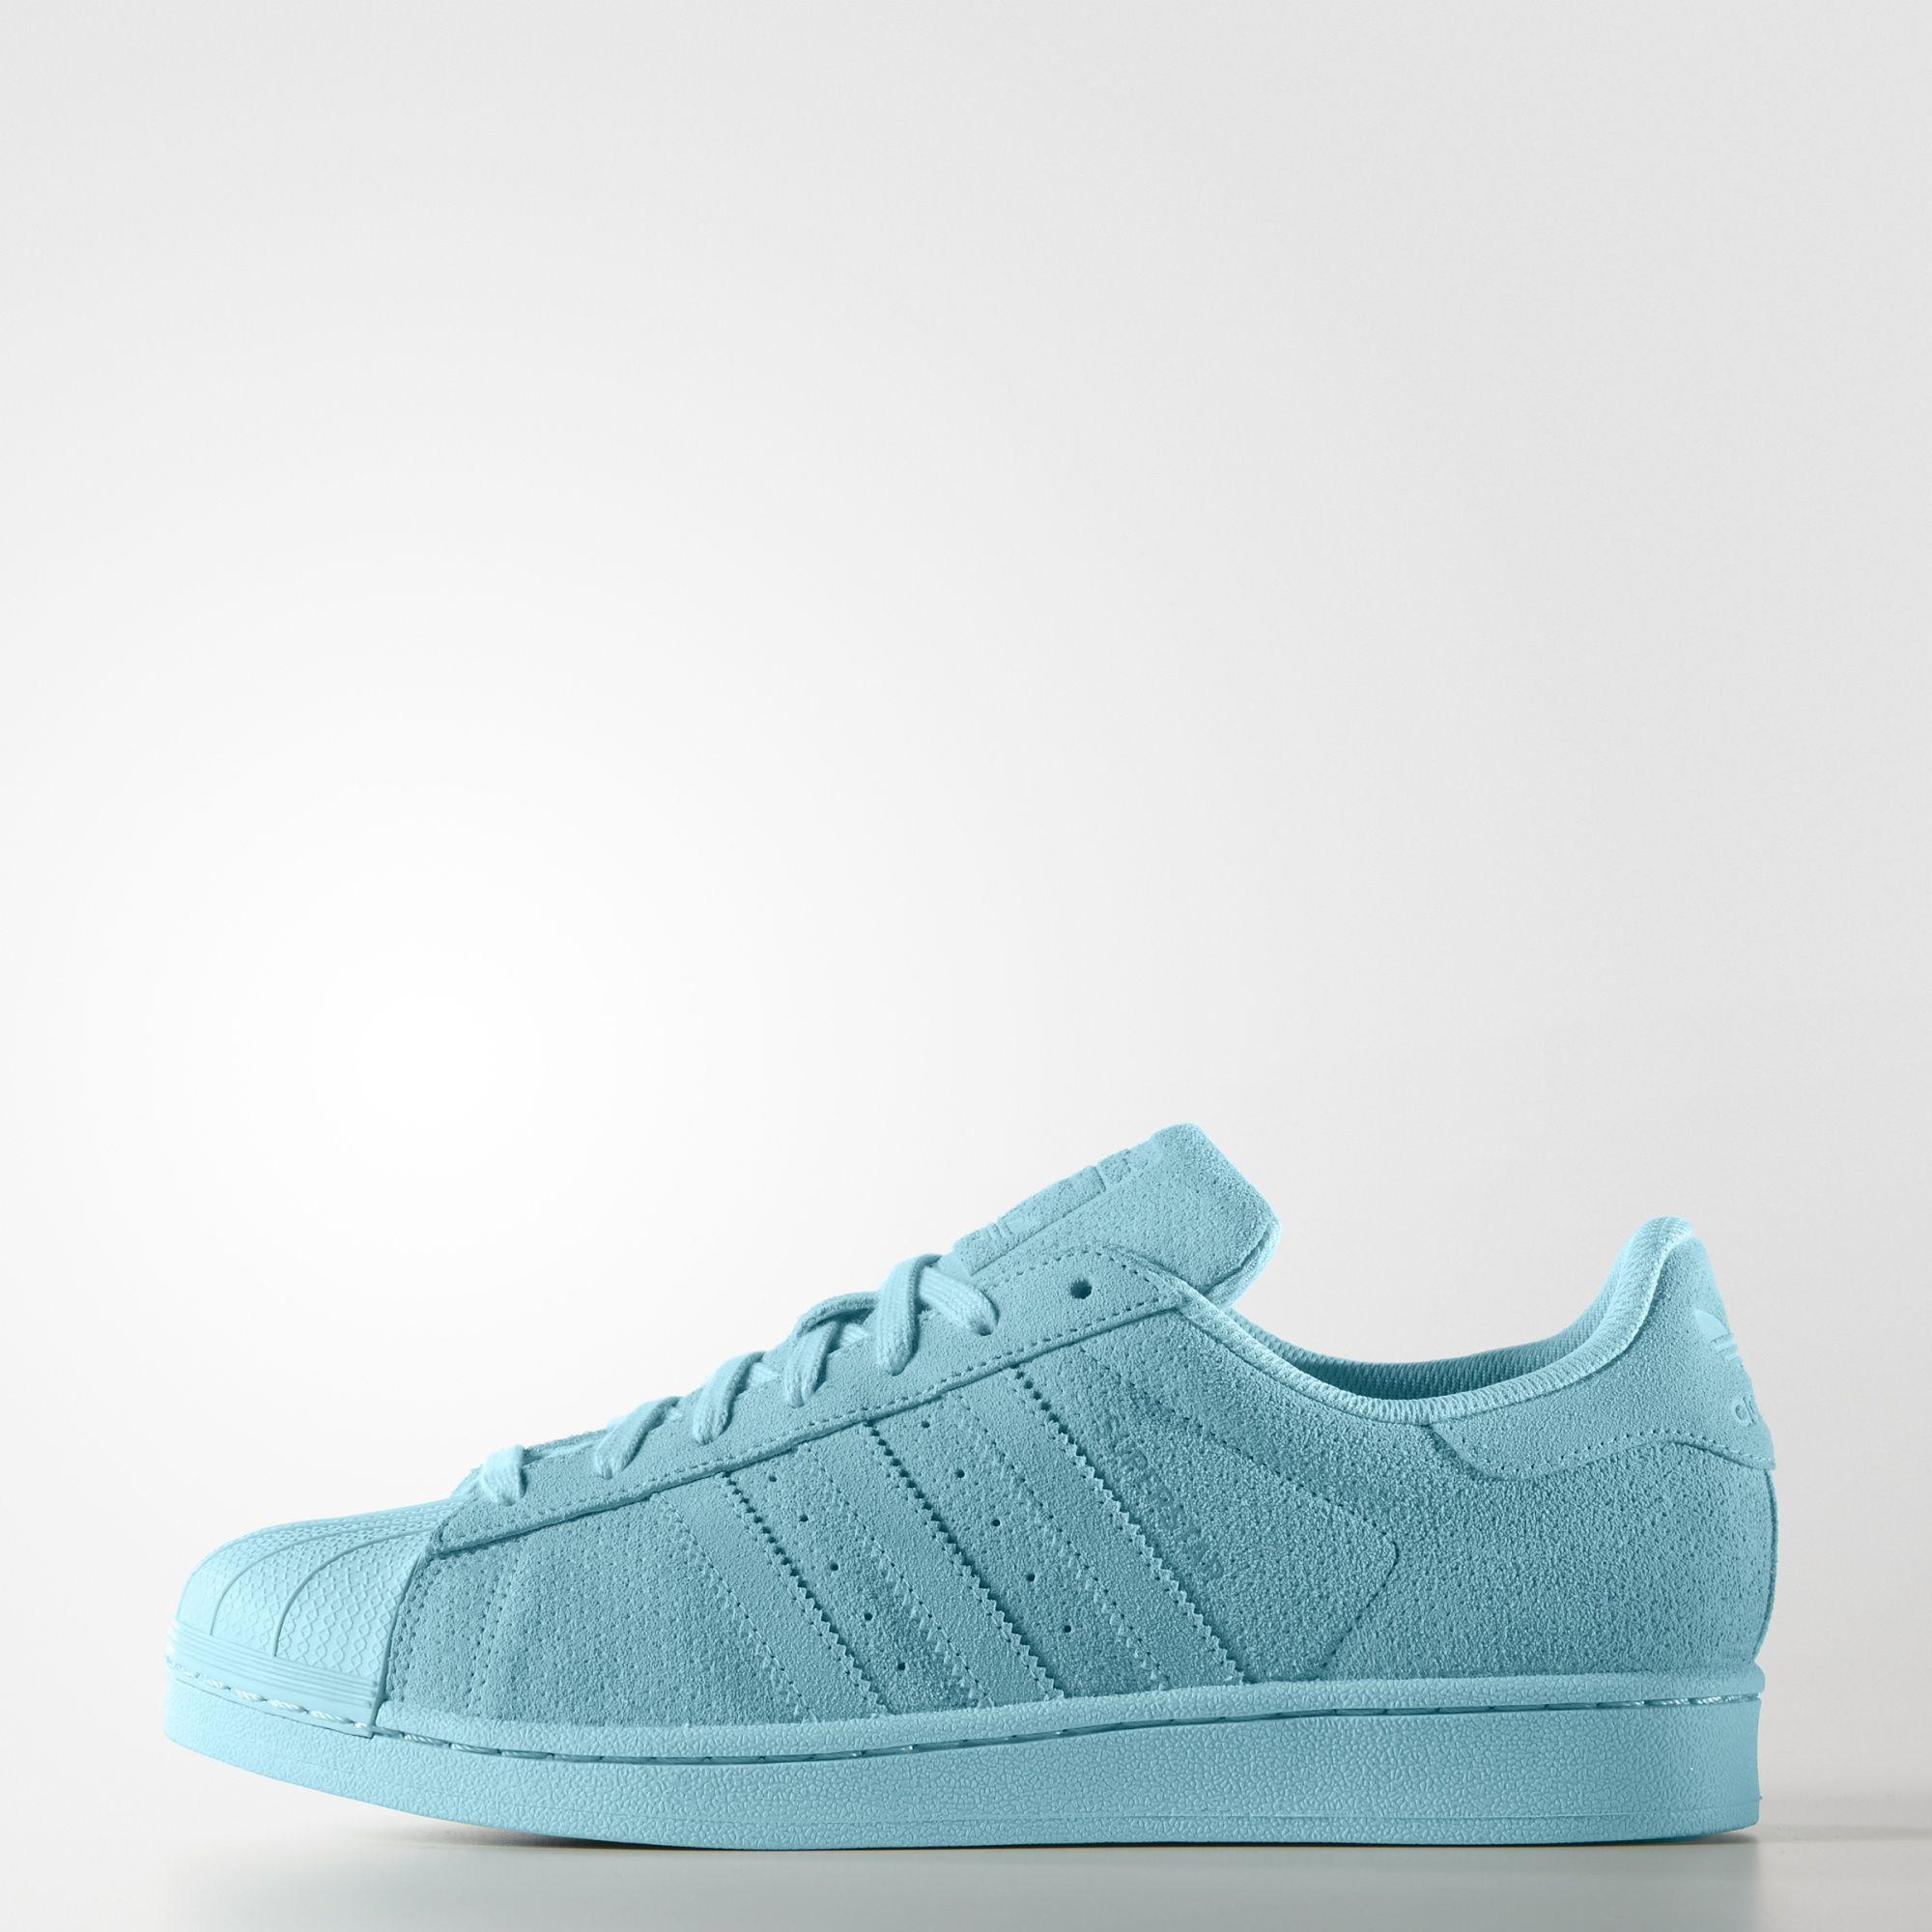 chaussures chaussures pinterest superstars chaussures adidas superstar superstar adidas a68124